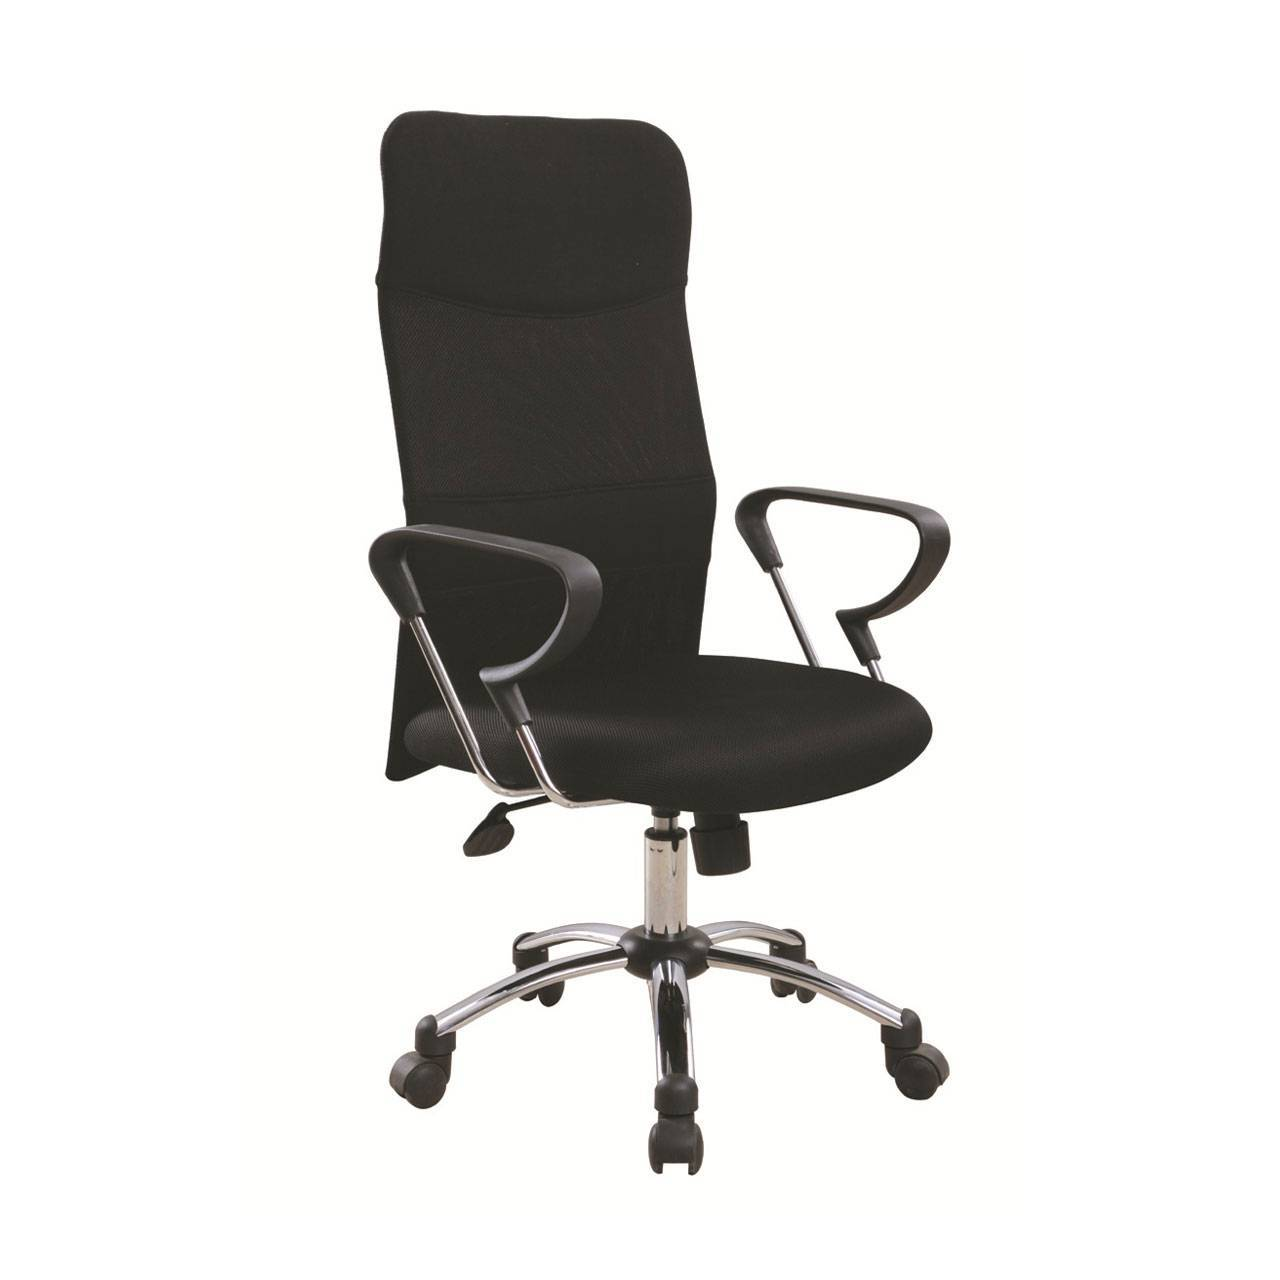 Flynn Executive Chair Furniture Store Manila Philippines  : W4087 from www.urbanconcepts.ph size 1280 x 1280 jpeg 40kB